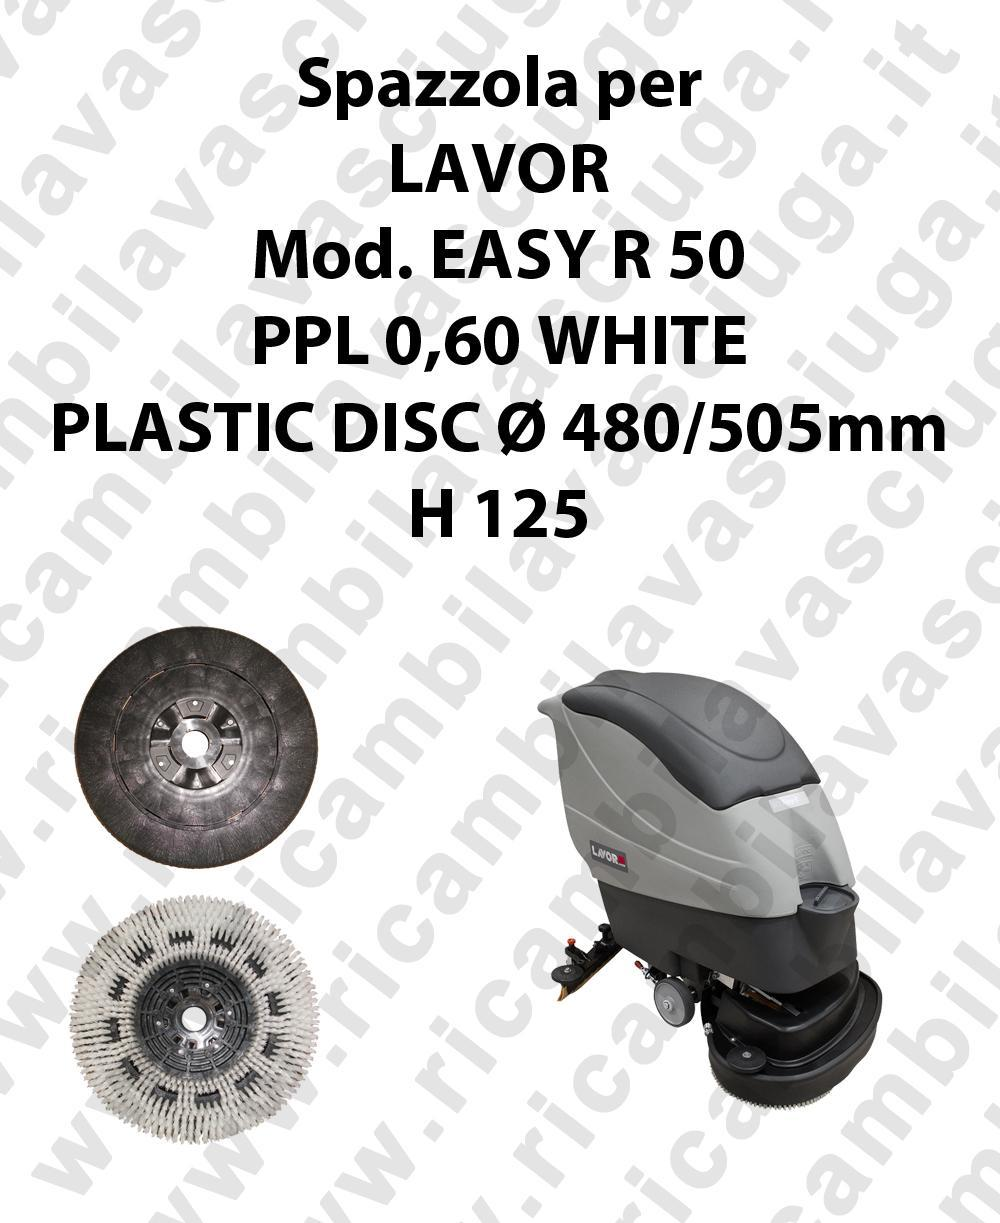 BROSSE A LAVER PPL 0,60 WHITE pour autolaveuses LAVOR Reference EASY R 50